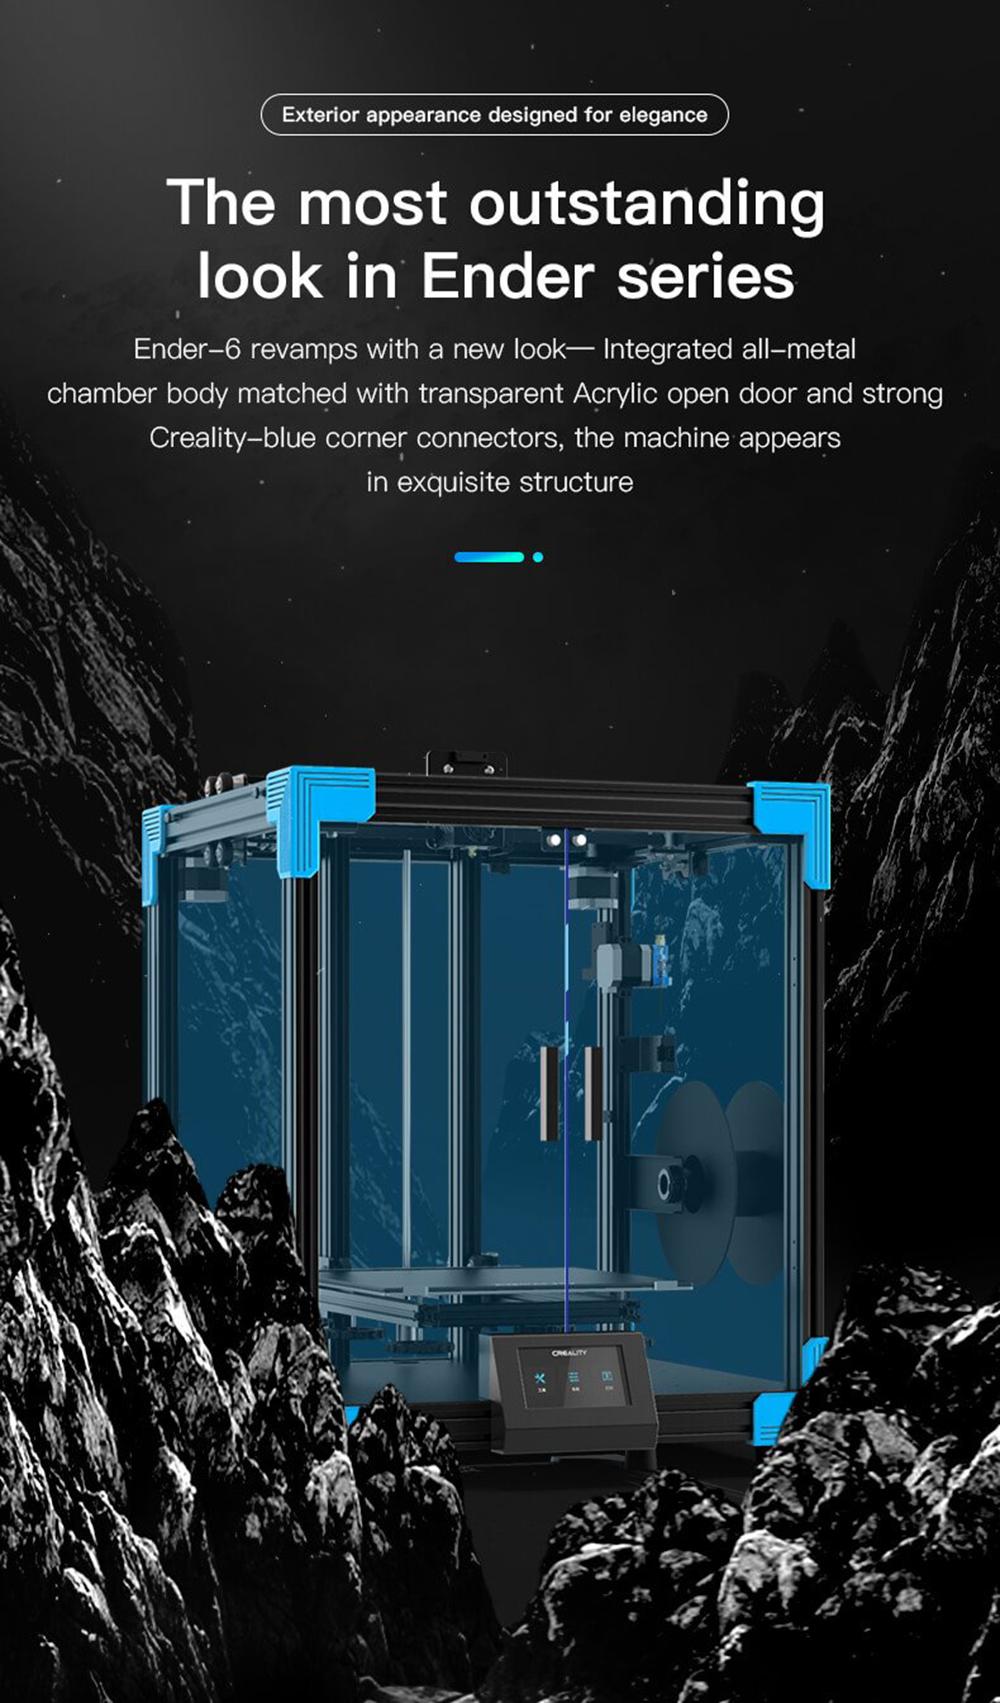 Creality3D Ender 6 3D-Drucker Bausatz - 250x250x400mm - Ender 6 in herausragender Optik